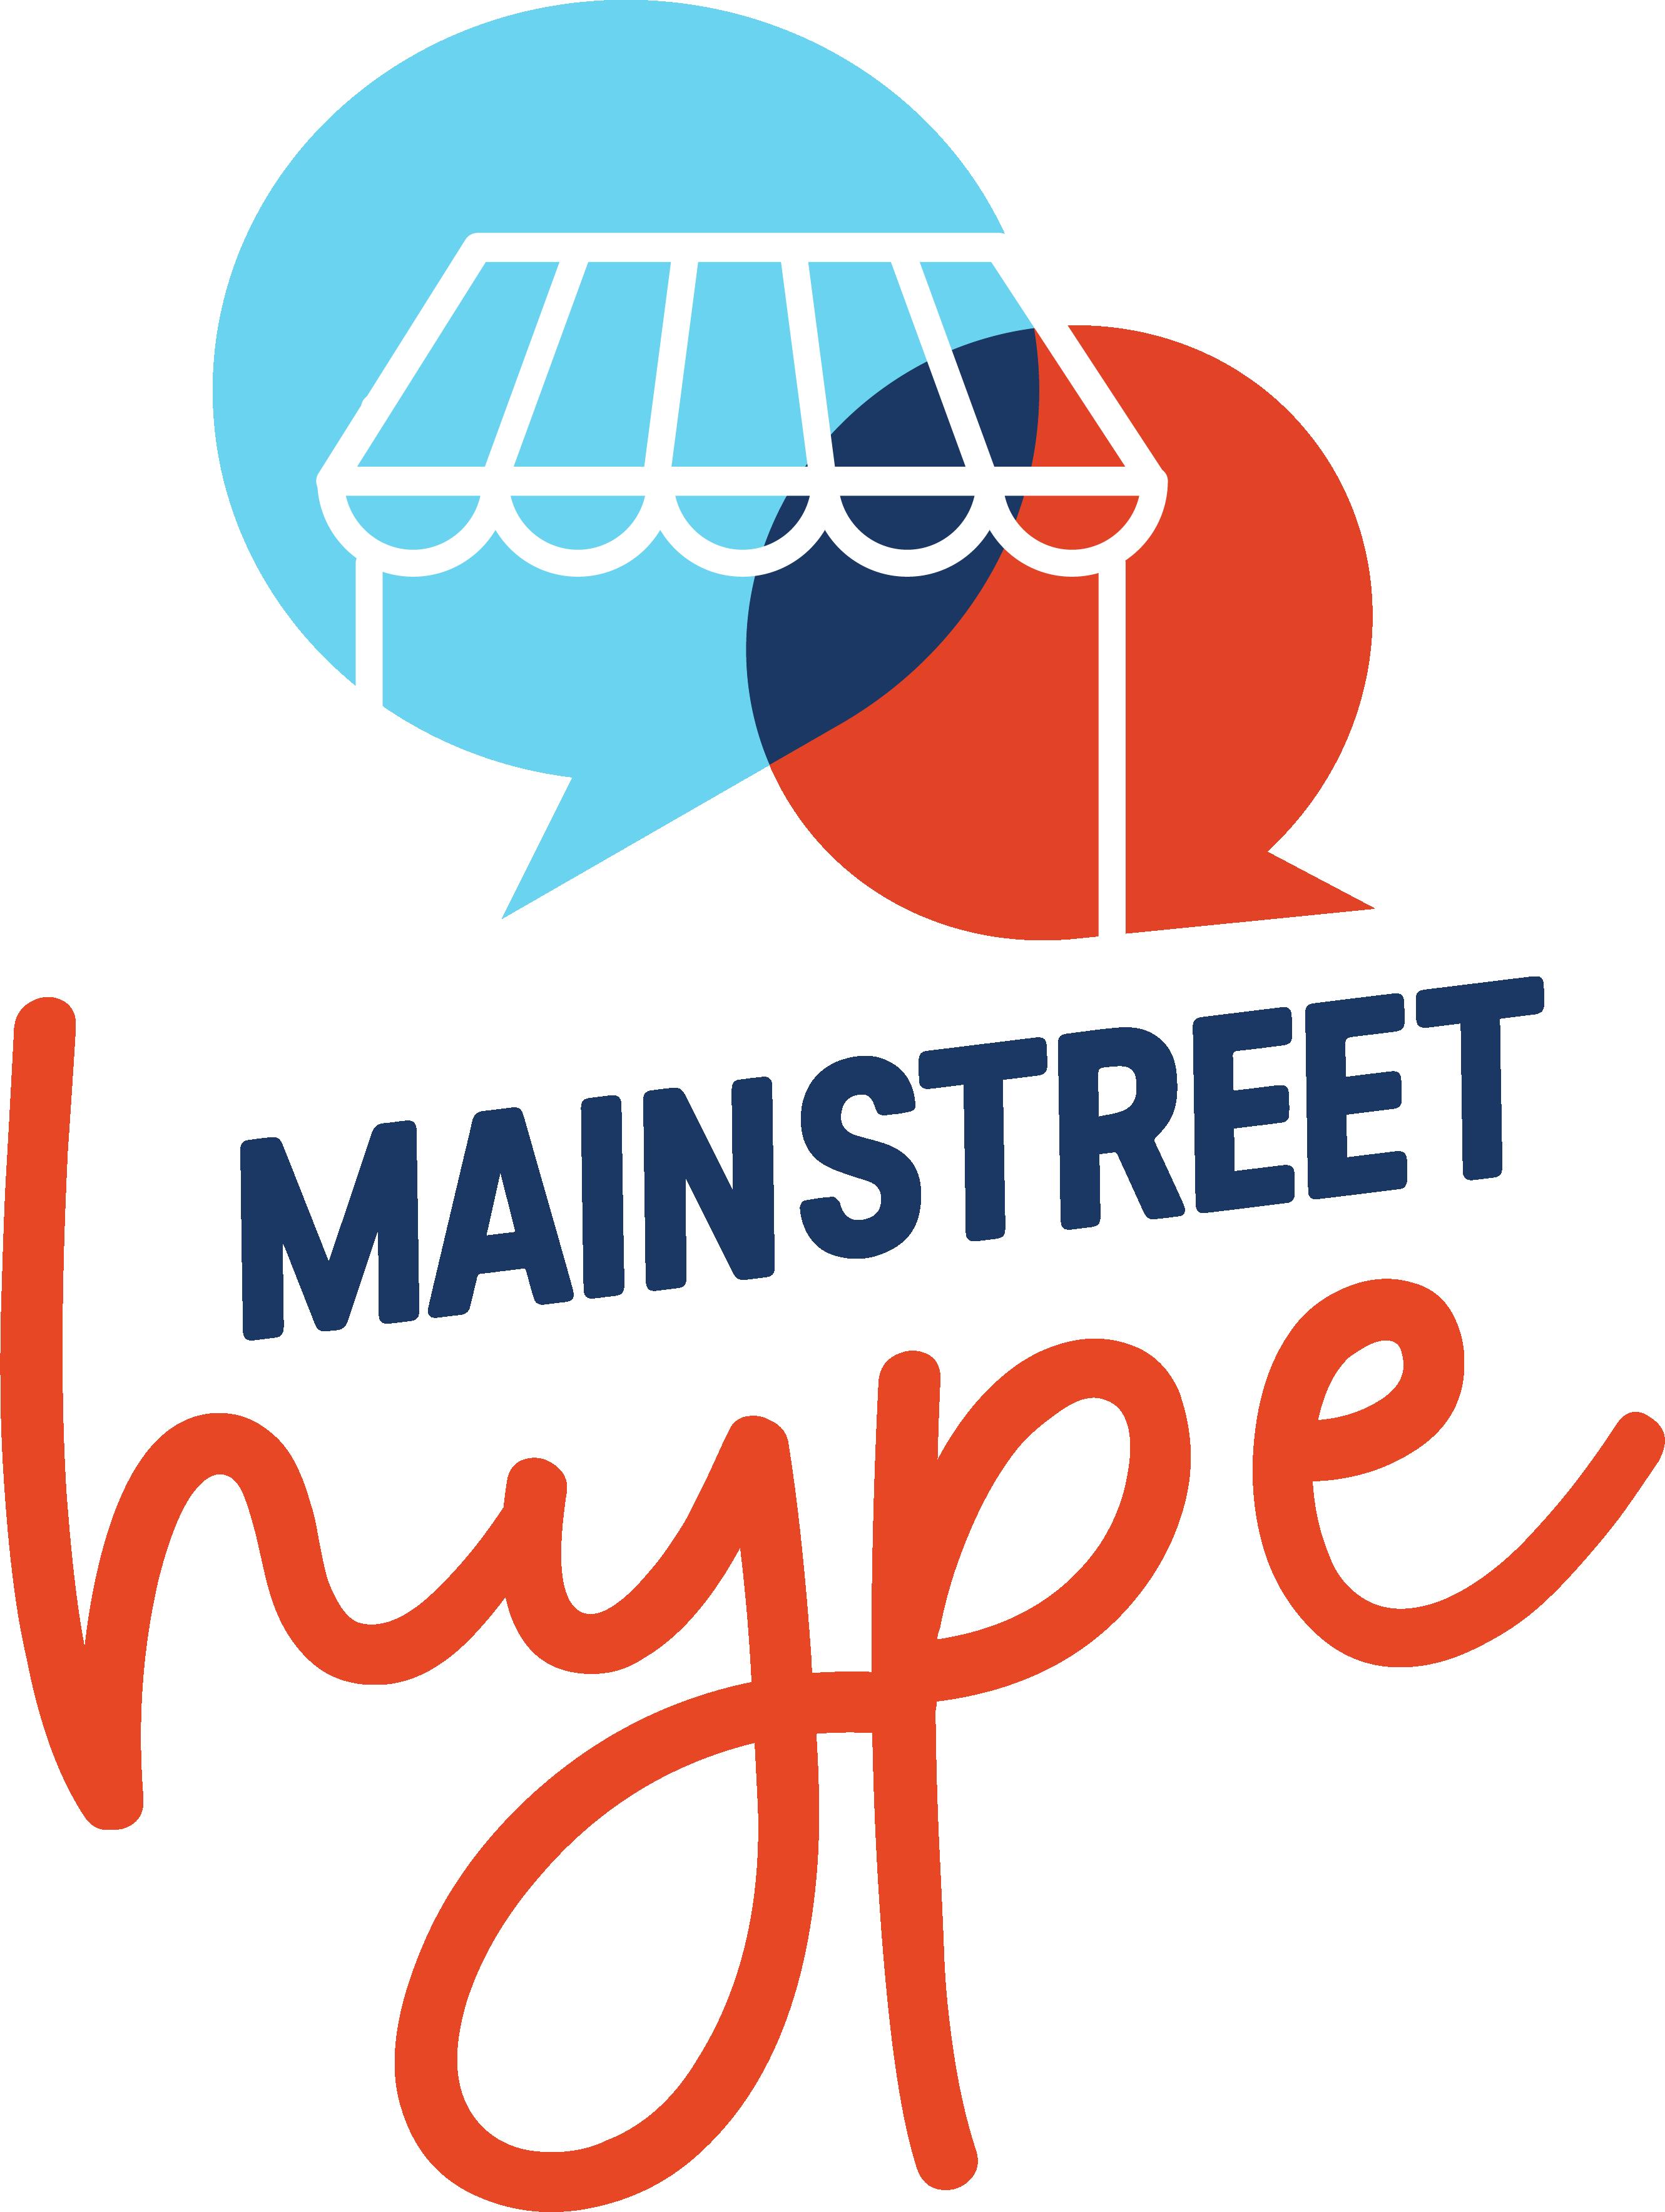 Mainstreet Hype